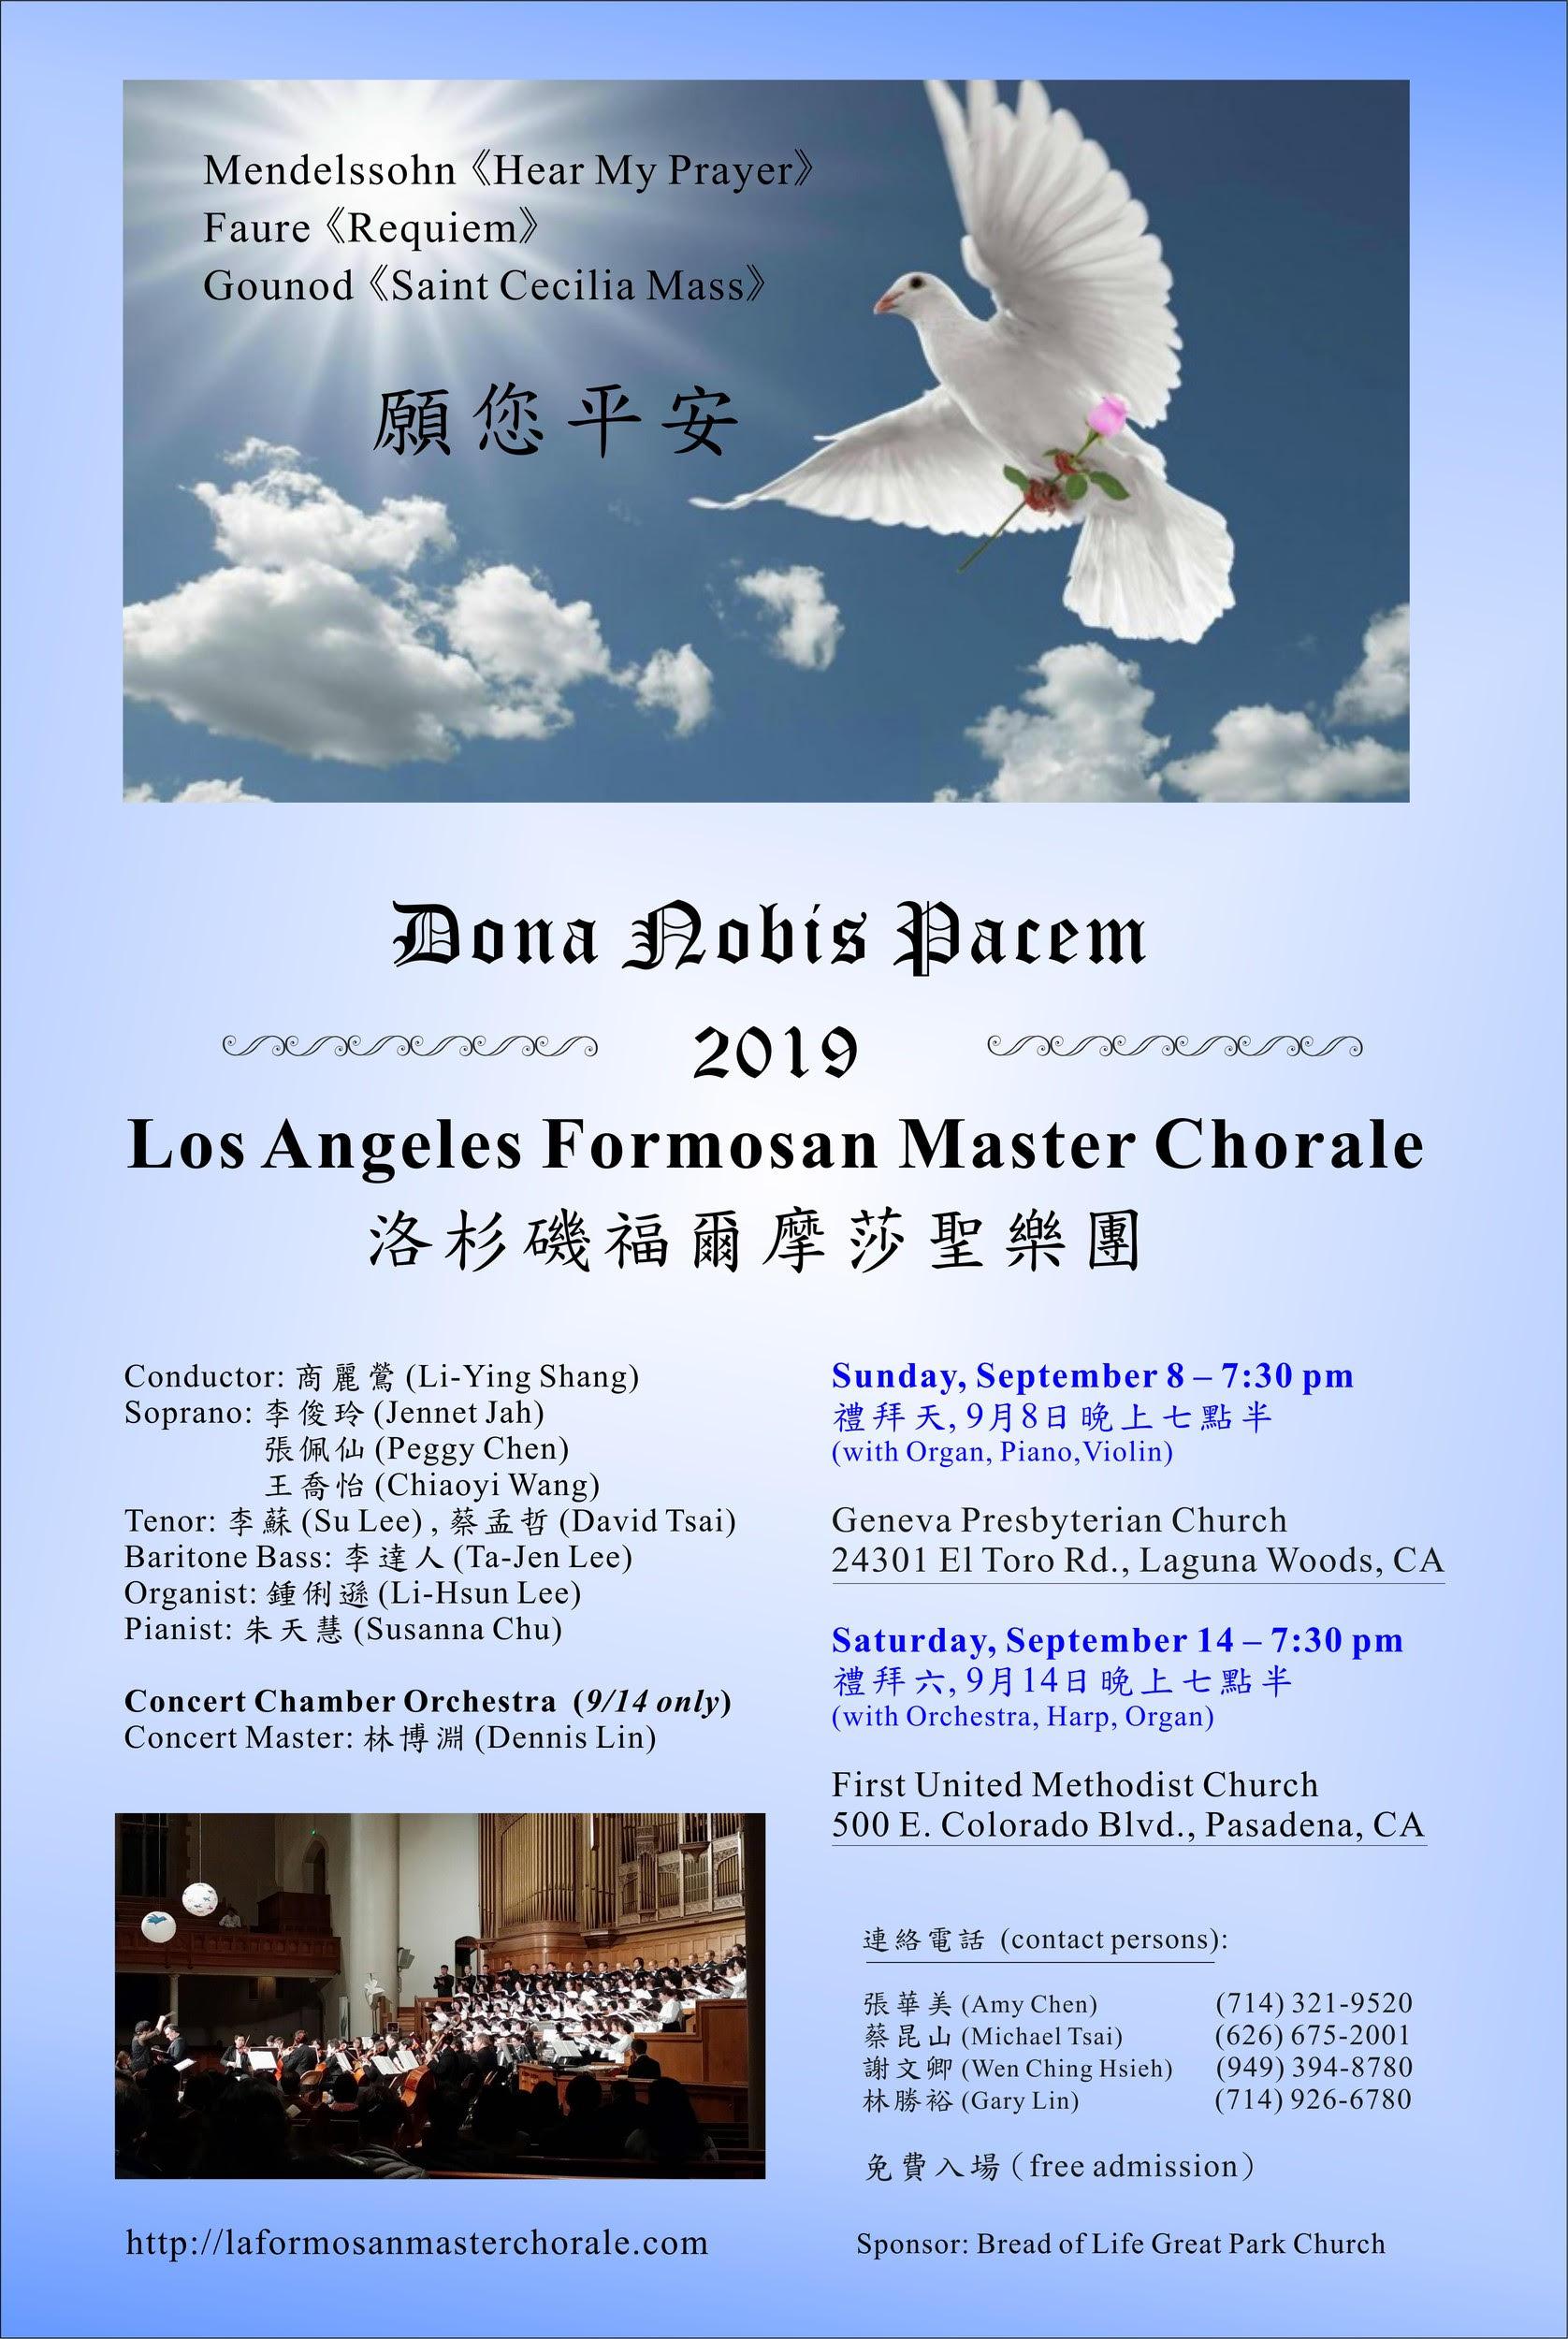 150. Los Angeles Formosan Master Chorale/2019